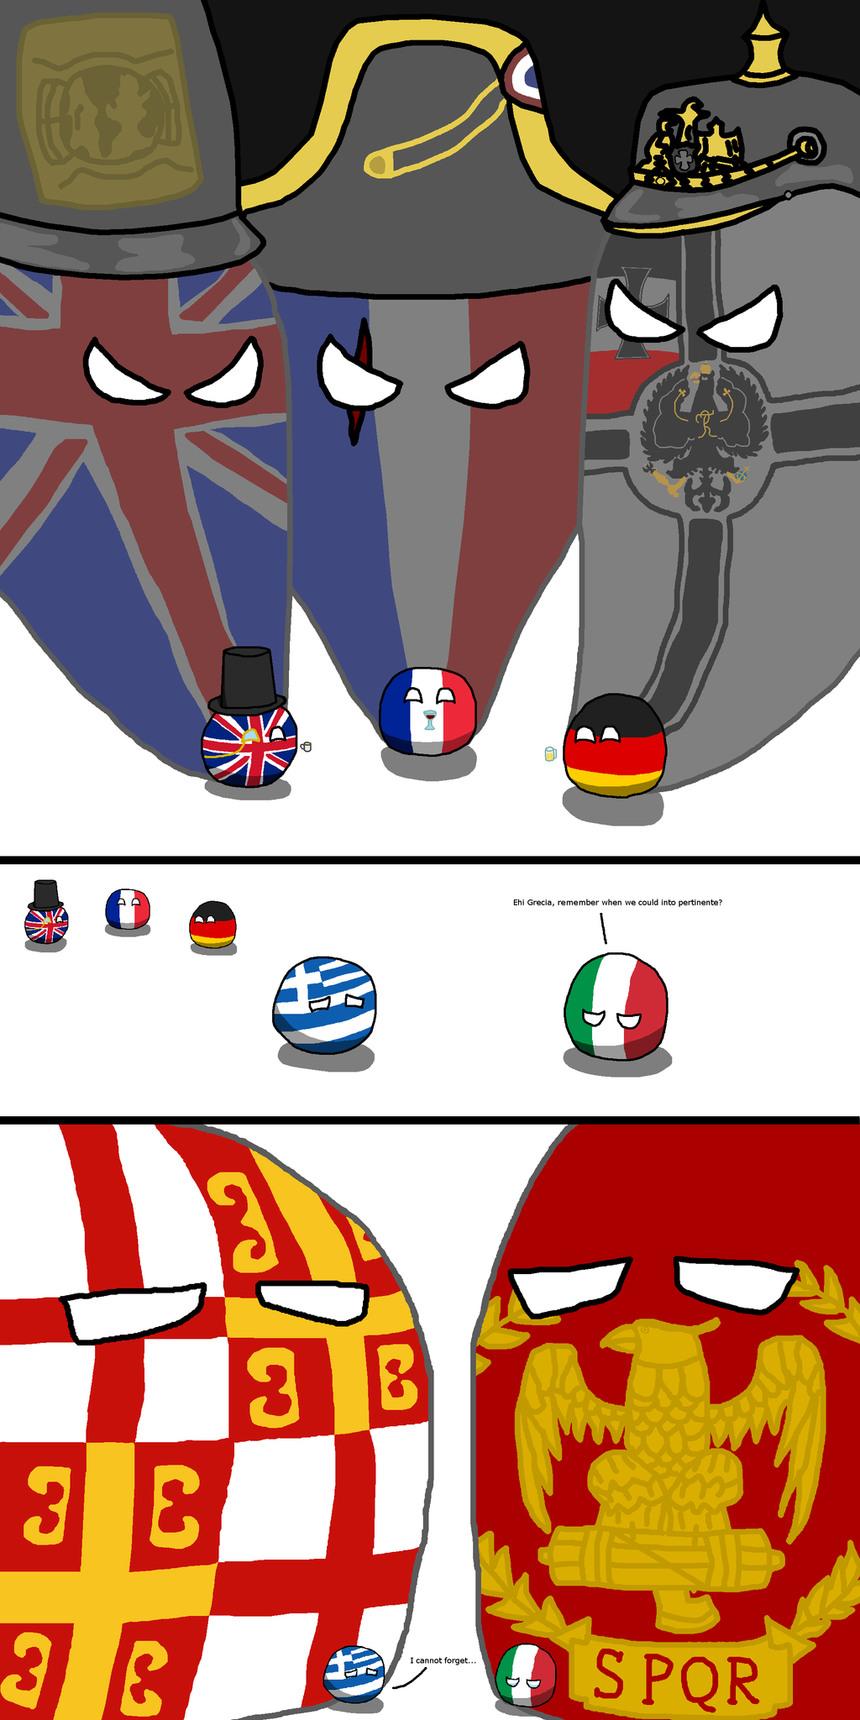 Grecia grande spqr - meme